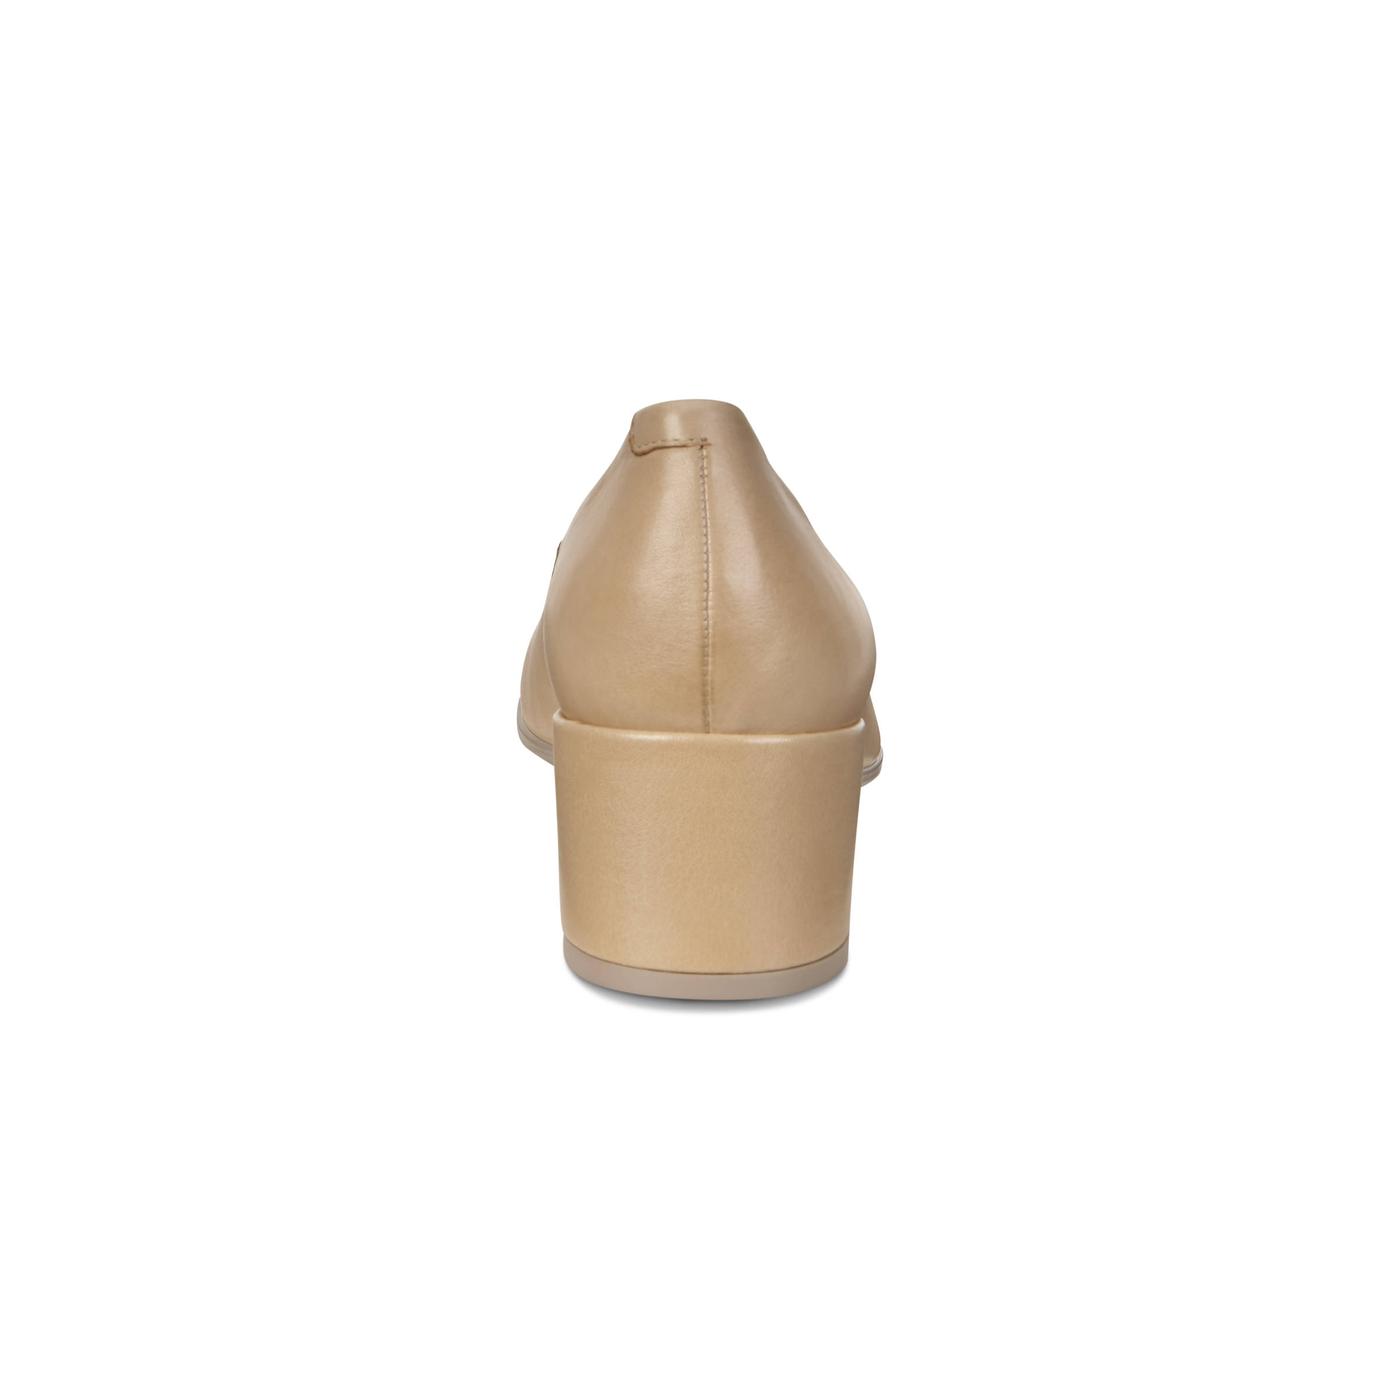 ECCO SHAPE BLOCK Modern Pump 35mm